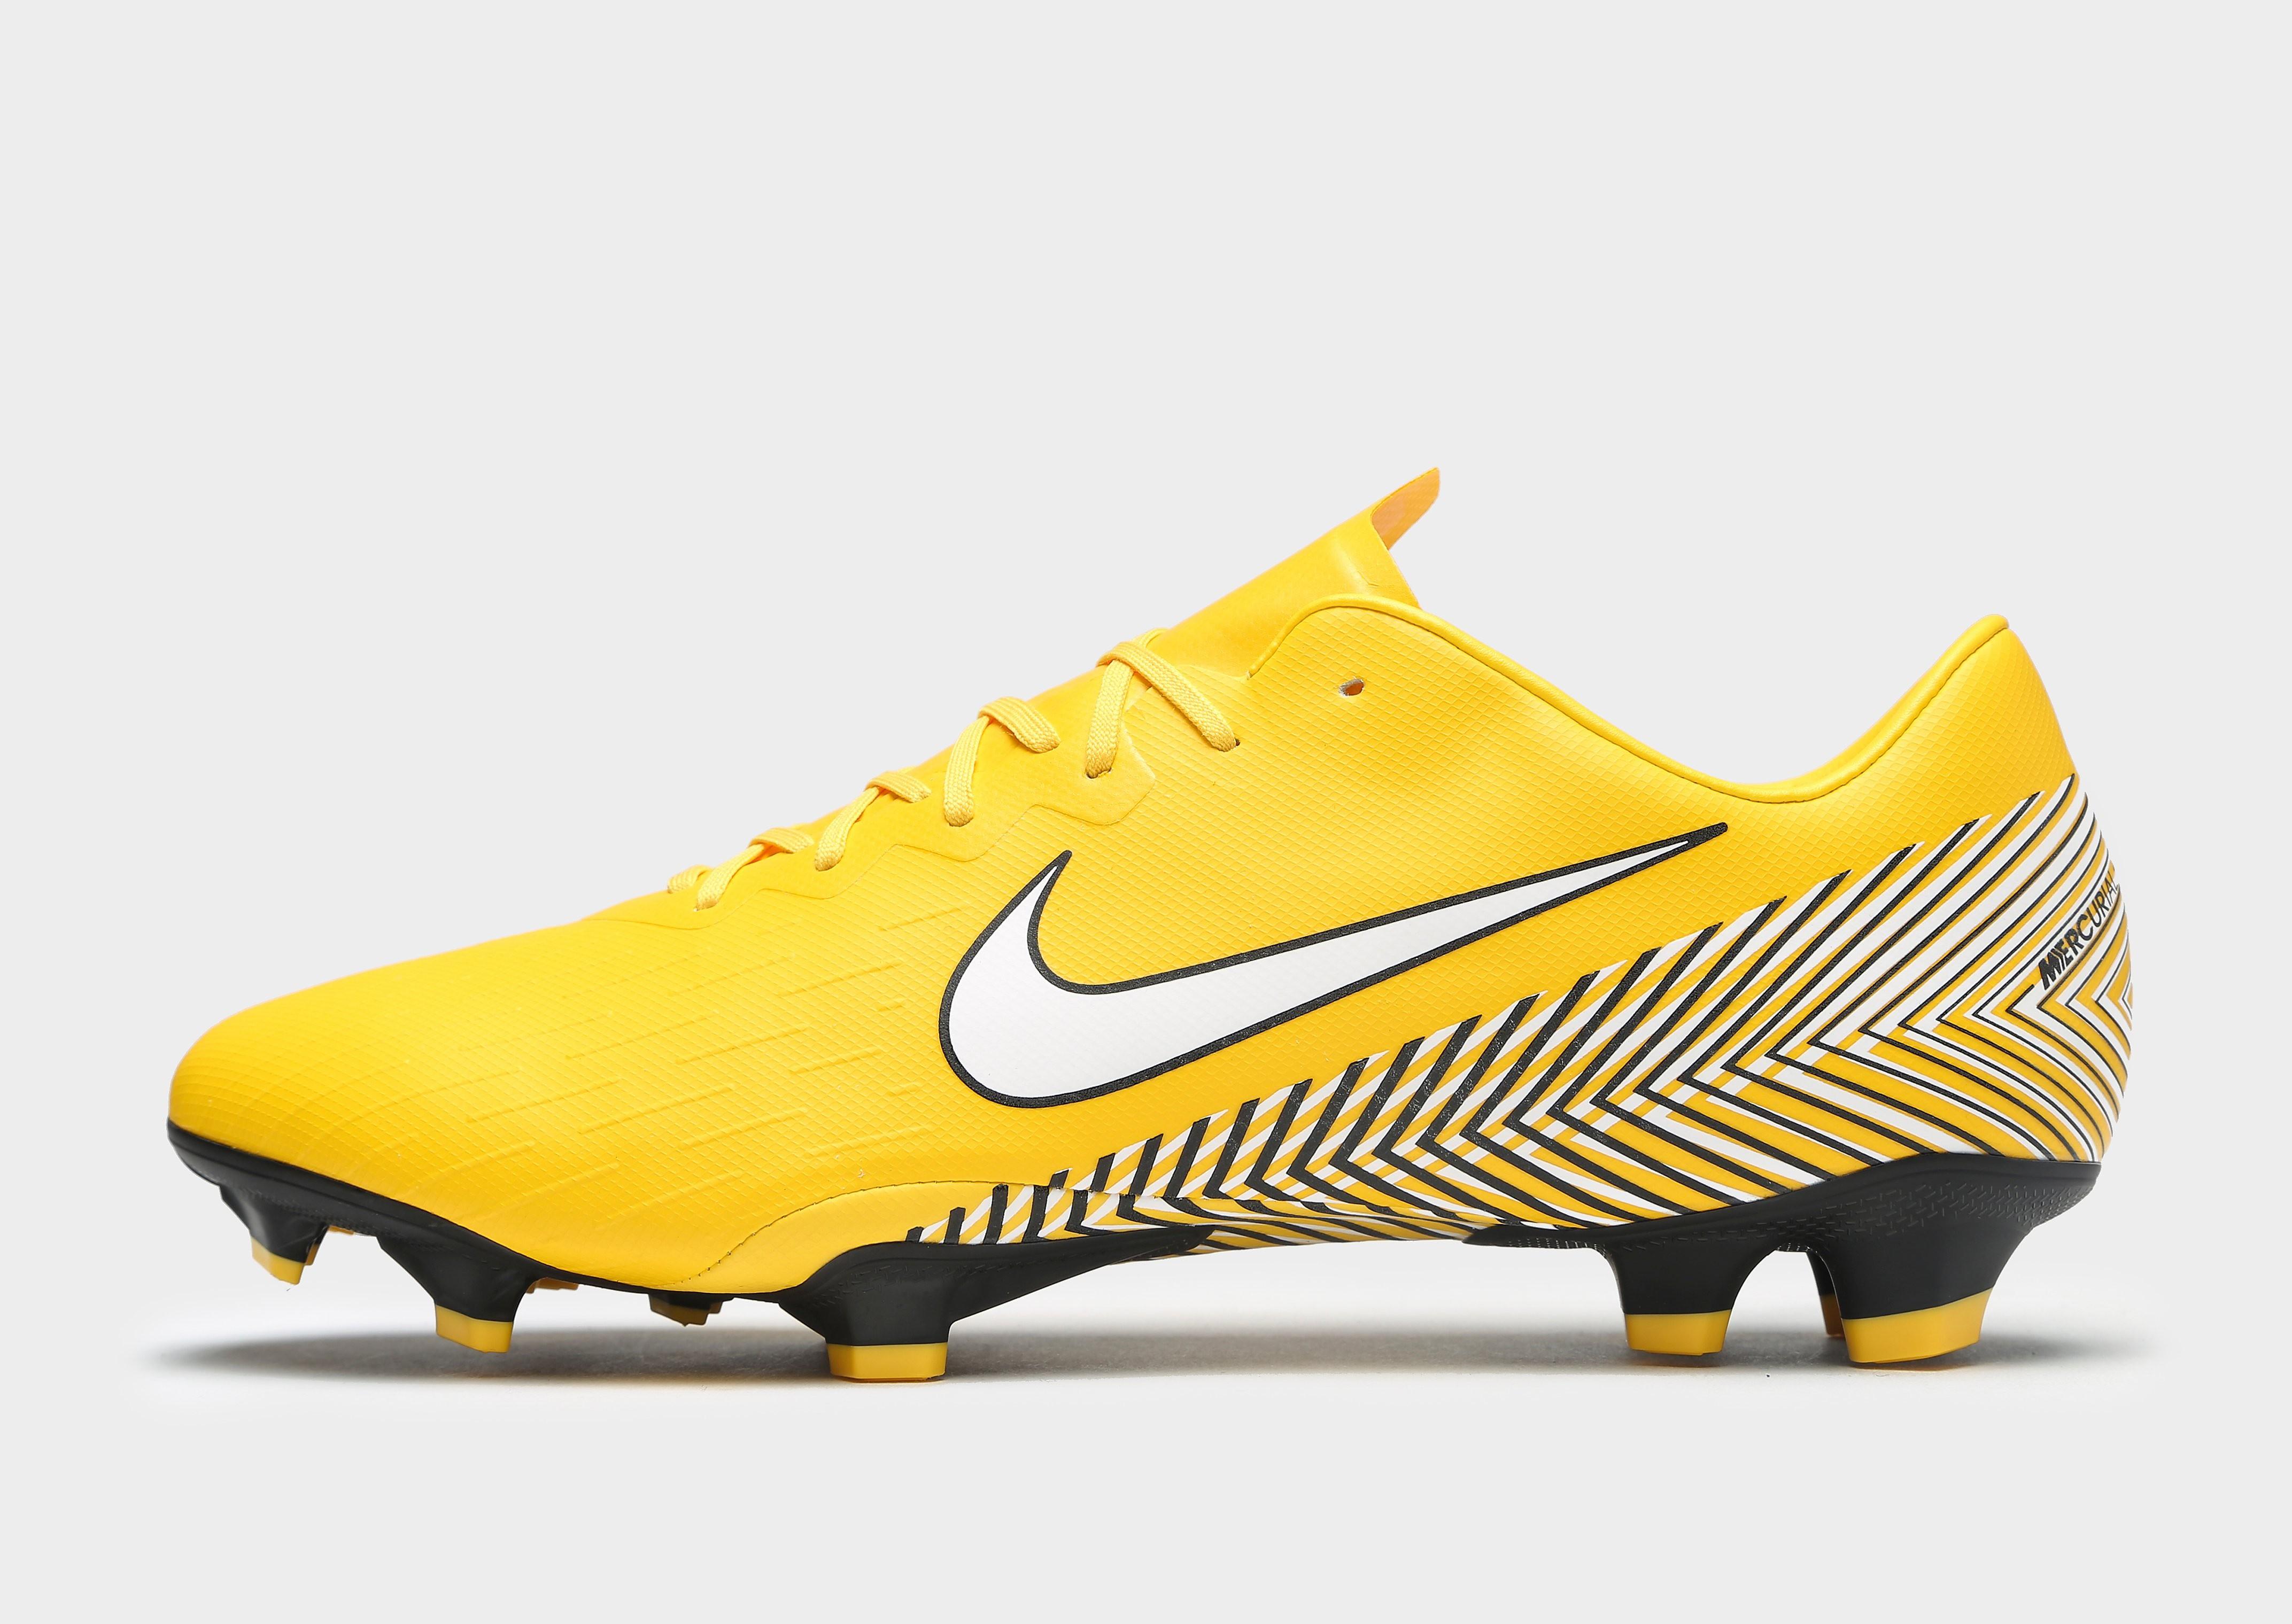 Nike Meu Jogo Mercurial Vapor Pro Neymar Jr FG Heren - Geel - Heren